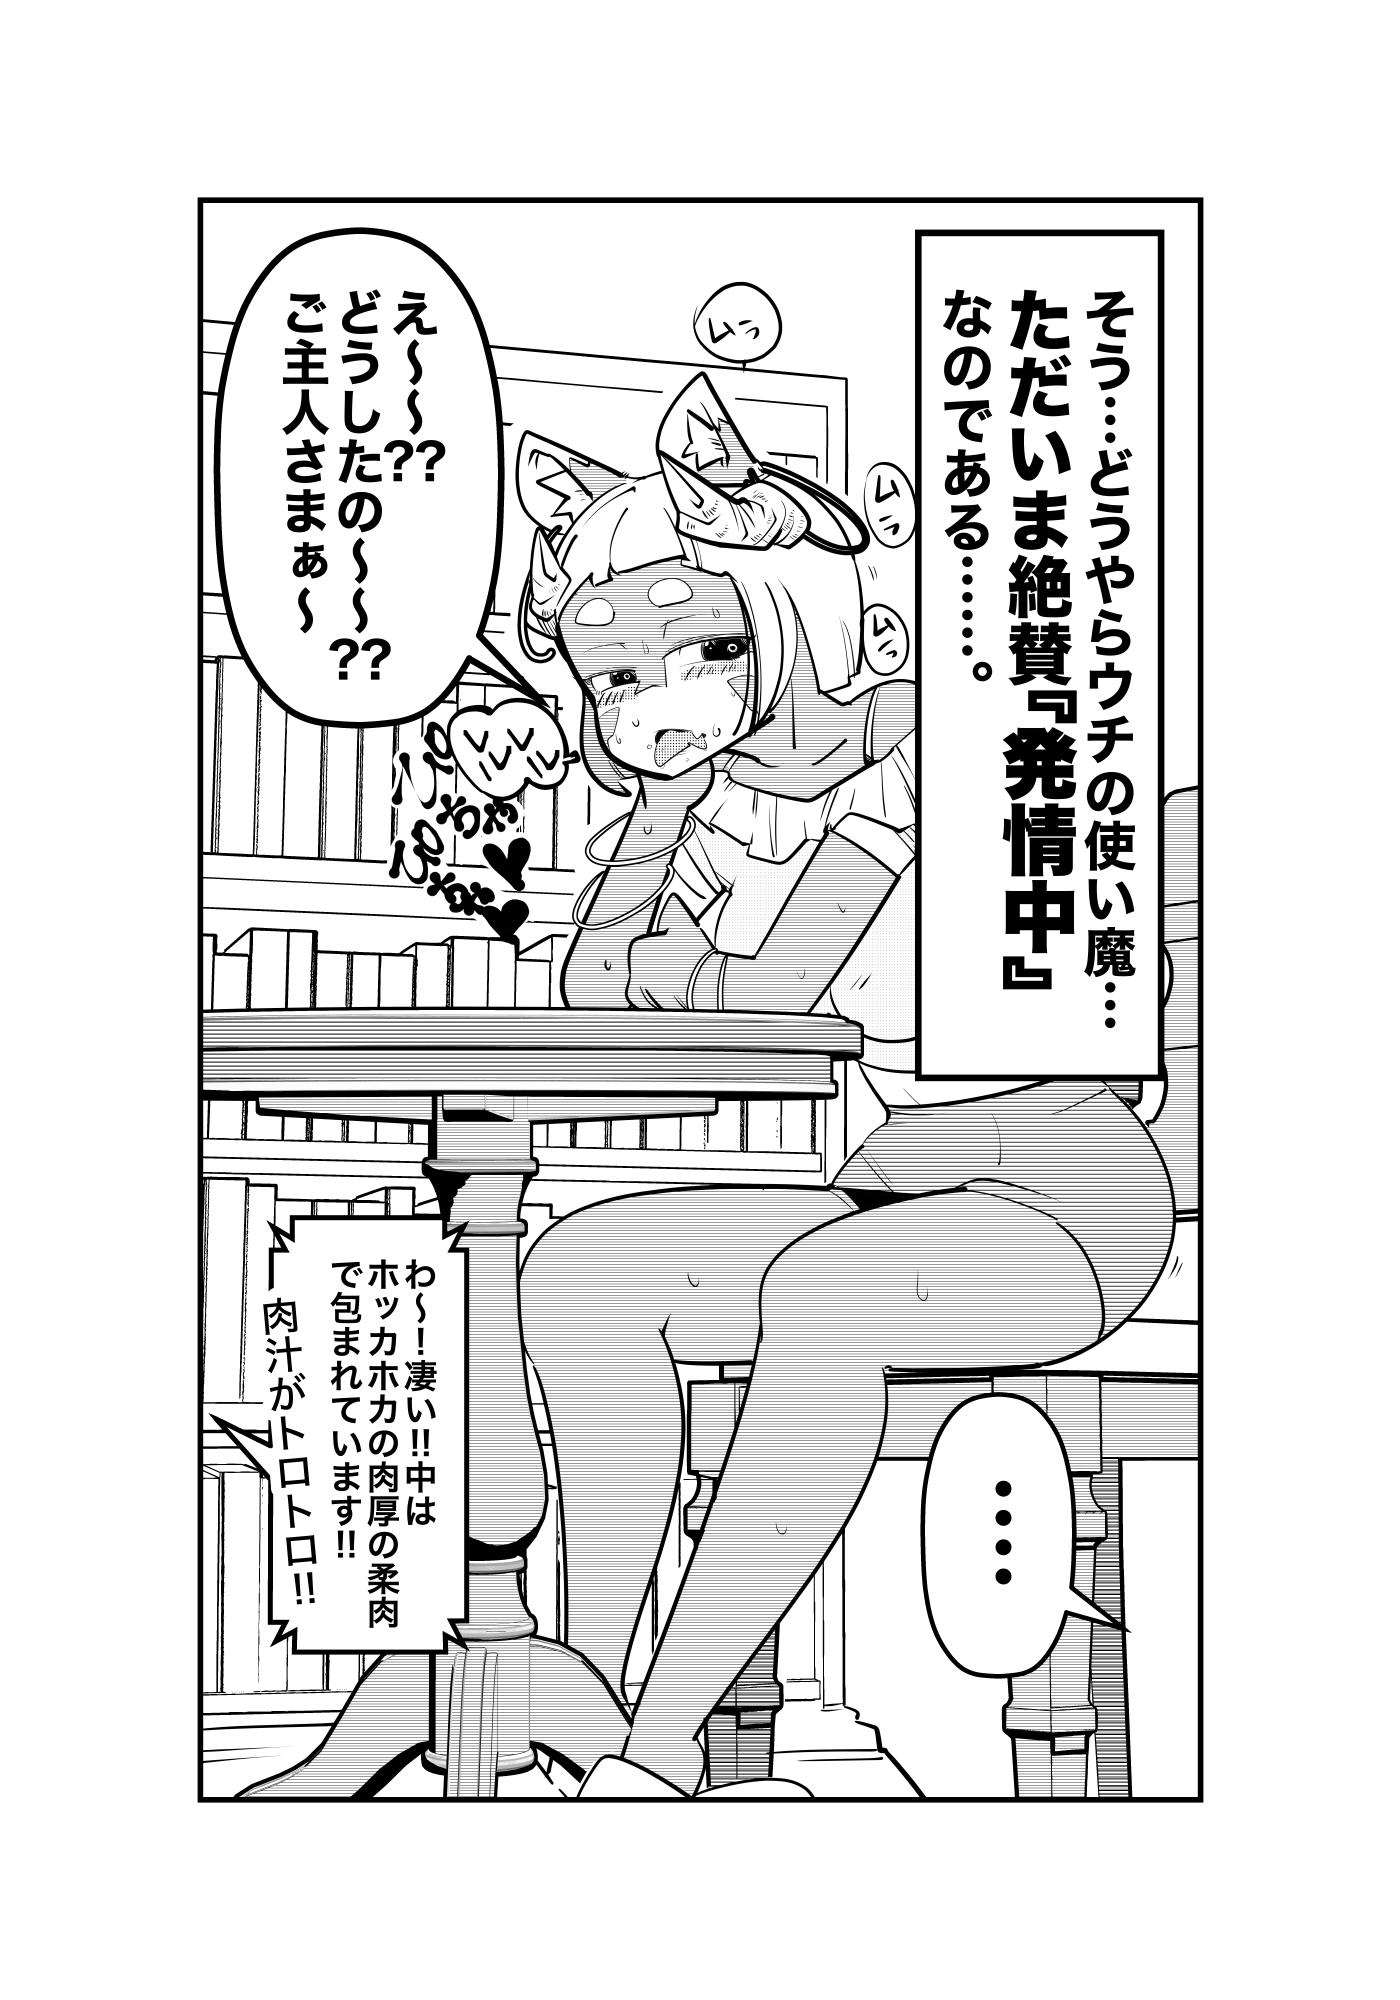 f:id:terashimaru117:20210915015721p:plain